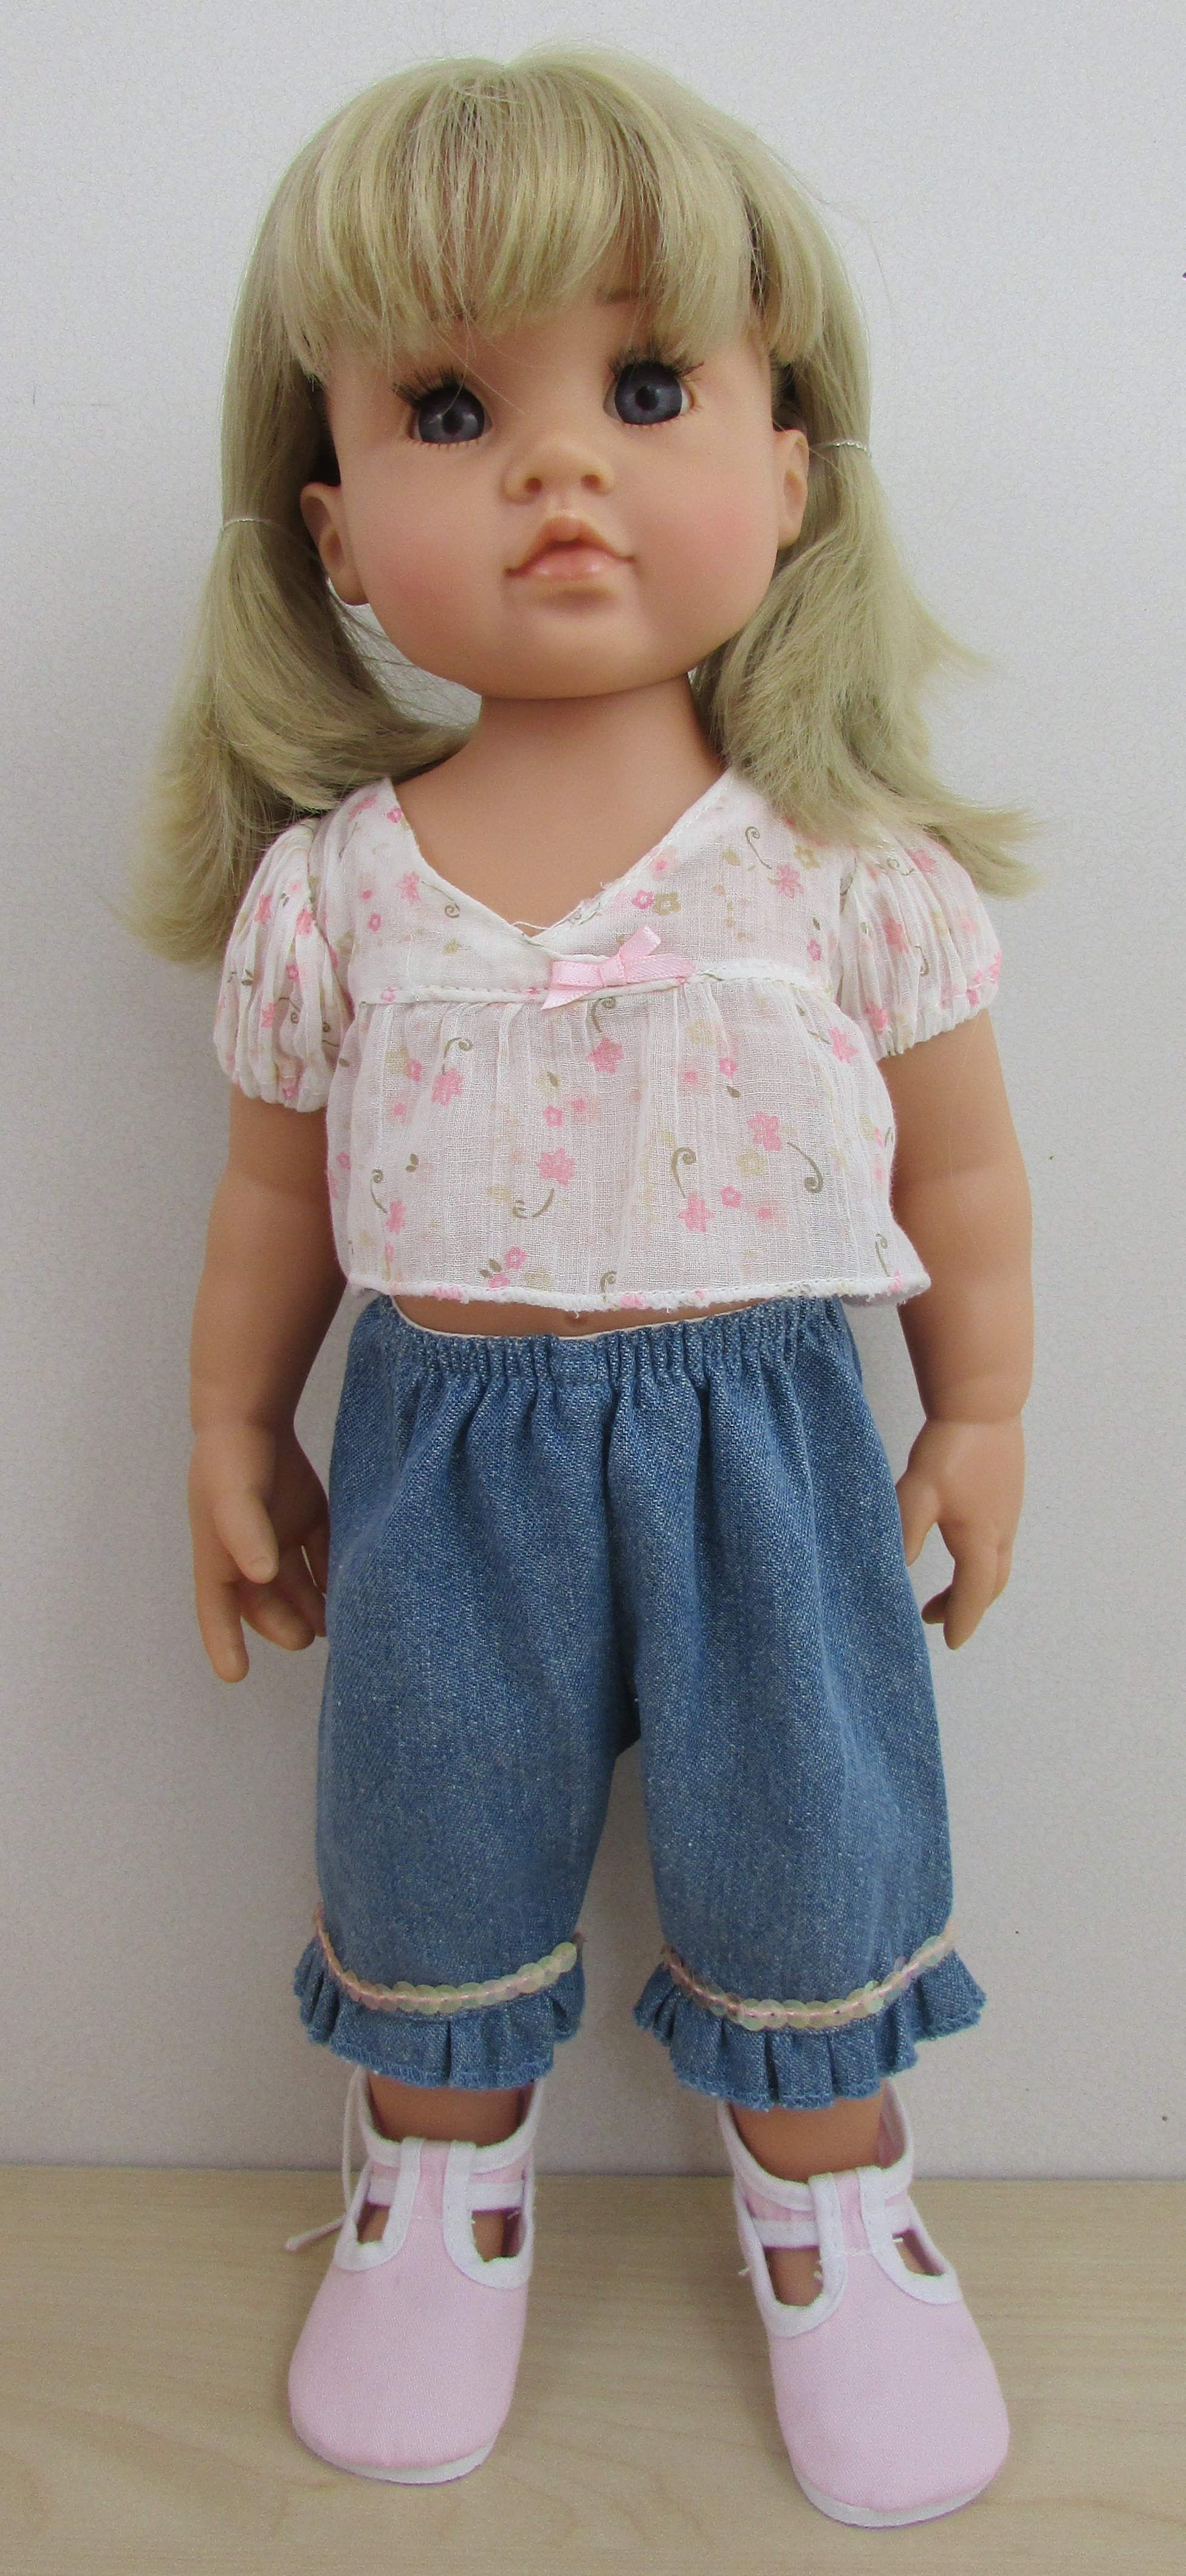 NIB Hildegard Gunzel Kinderland Gotz Collectible Doll